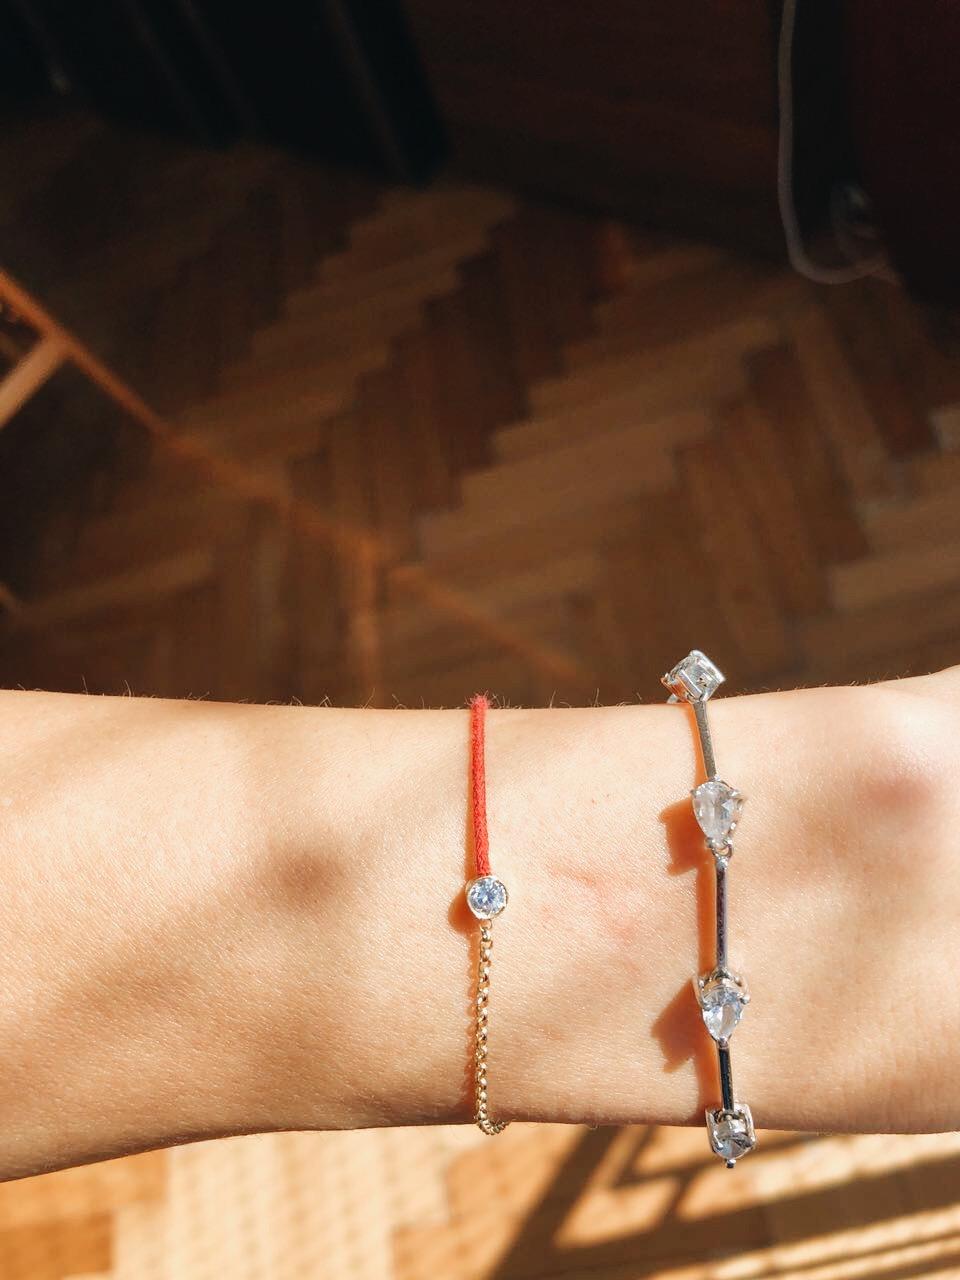 198A66B2 BDB1 45D4 85FC 1FD506EE6E04 - Marina Vicintin, Jewelry Designer